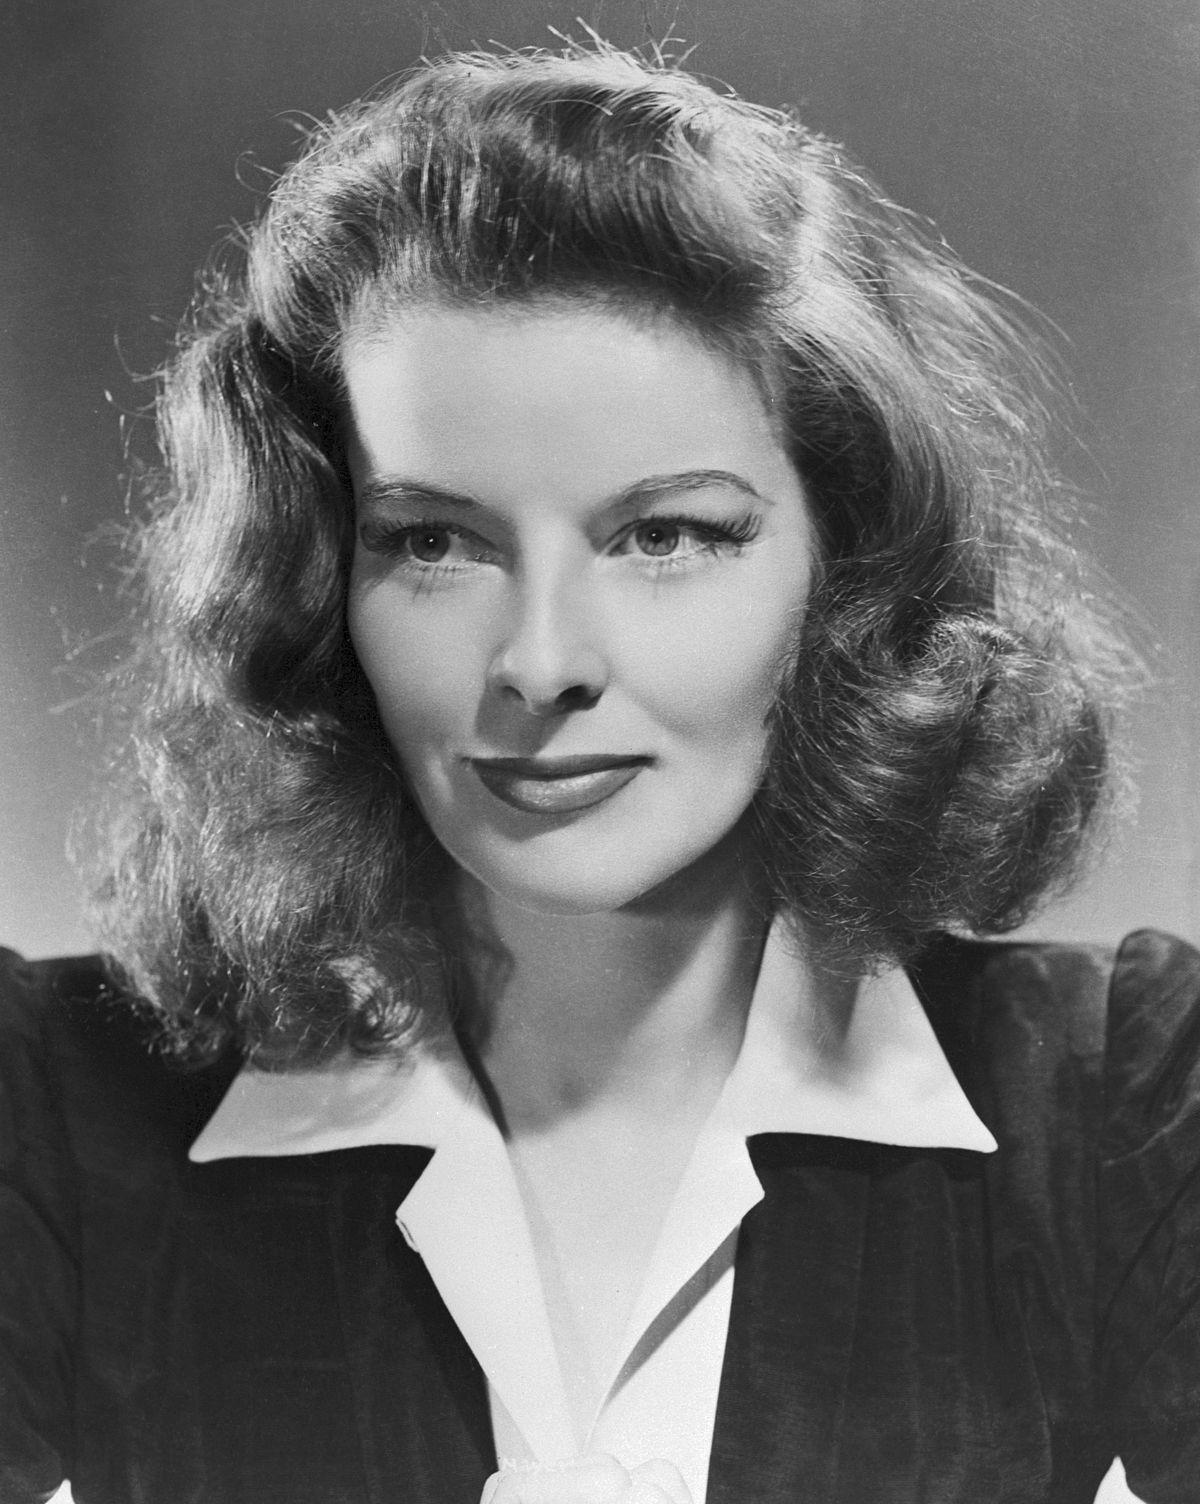 Portrait of Hepburn, aged 45